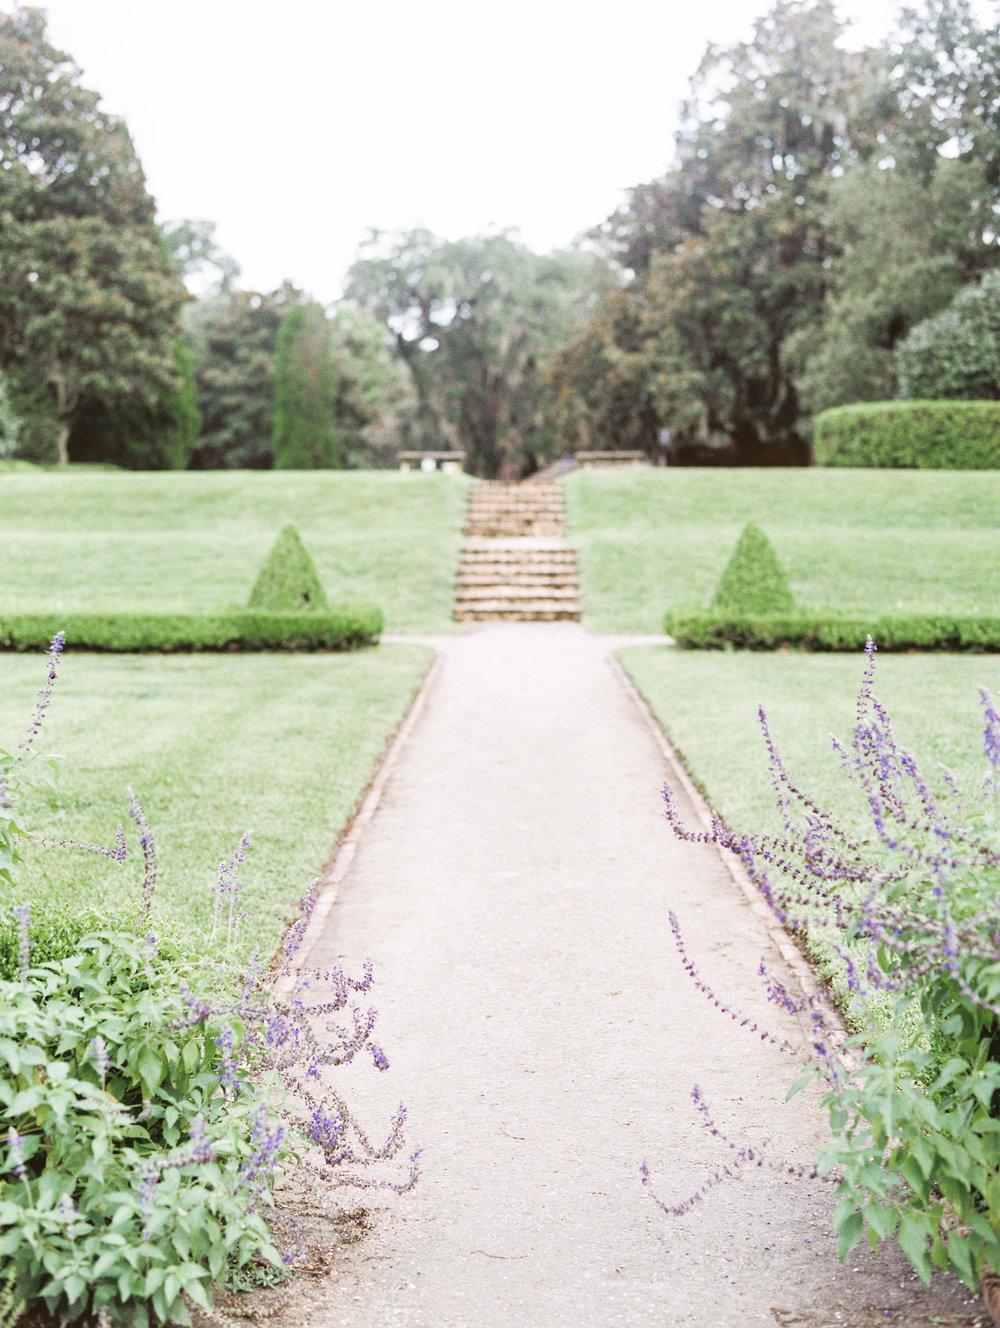 charleston-wedding-plantation-kailee-dimeglio-019.jpg